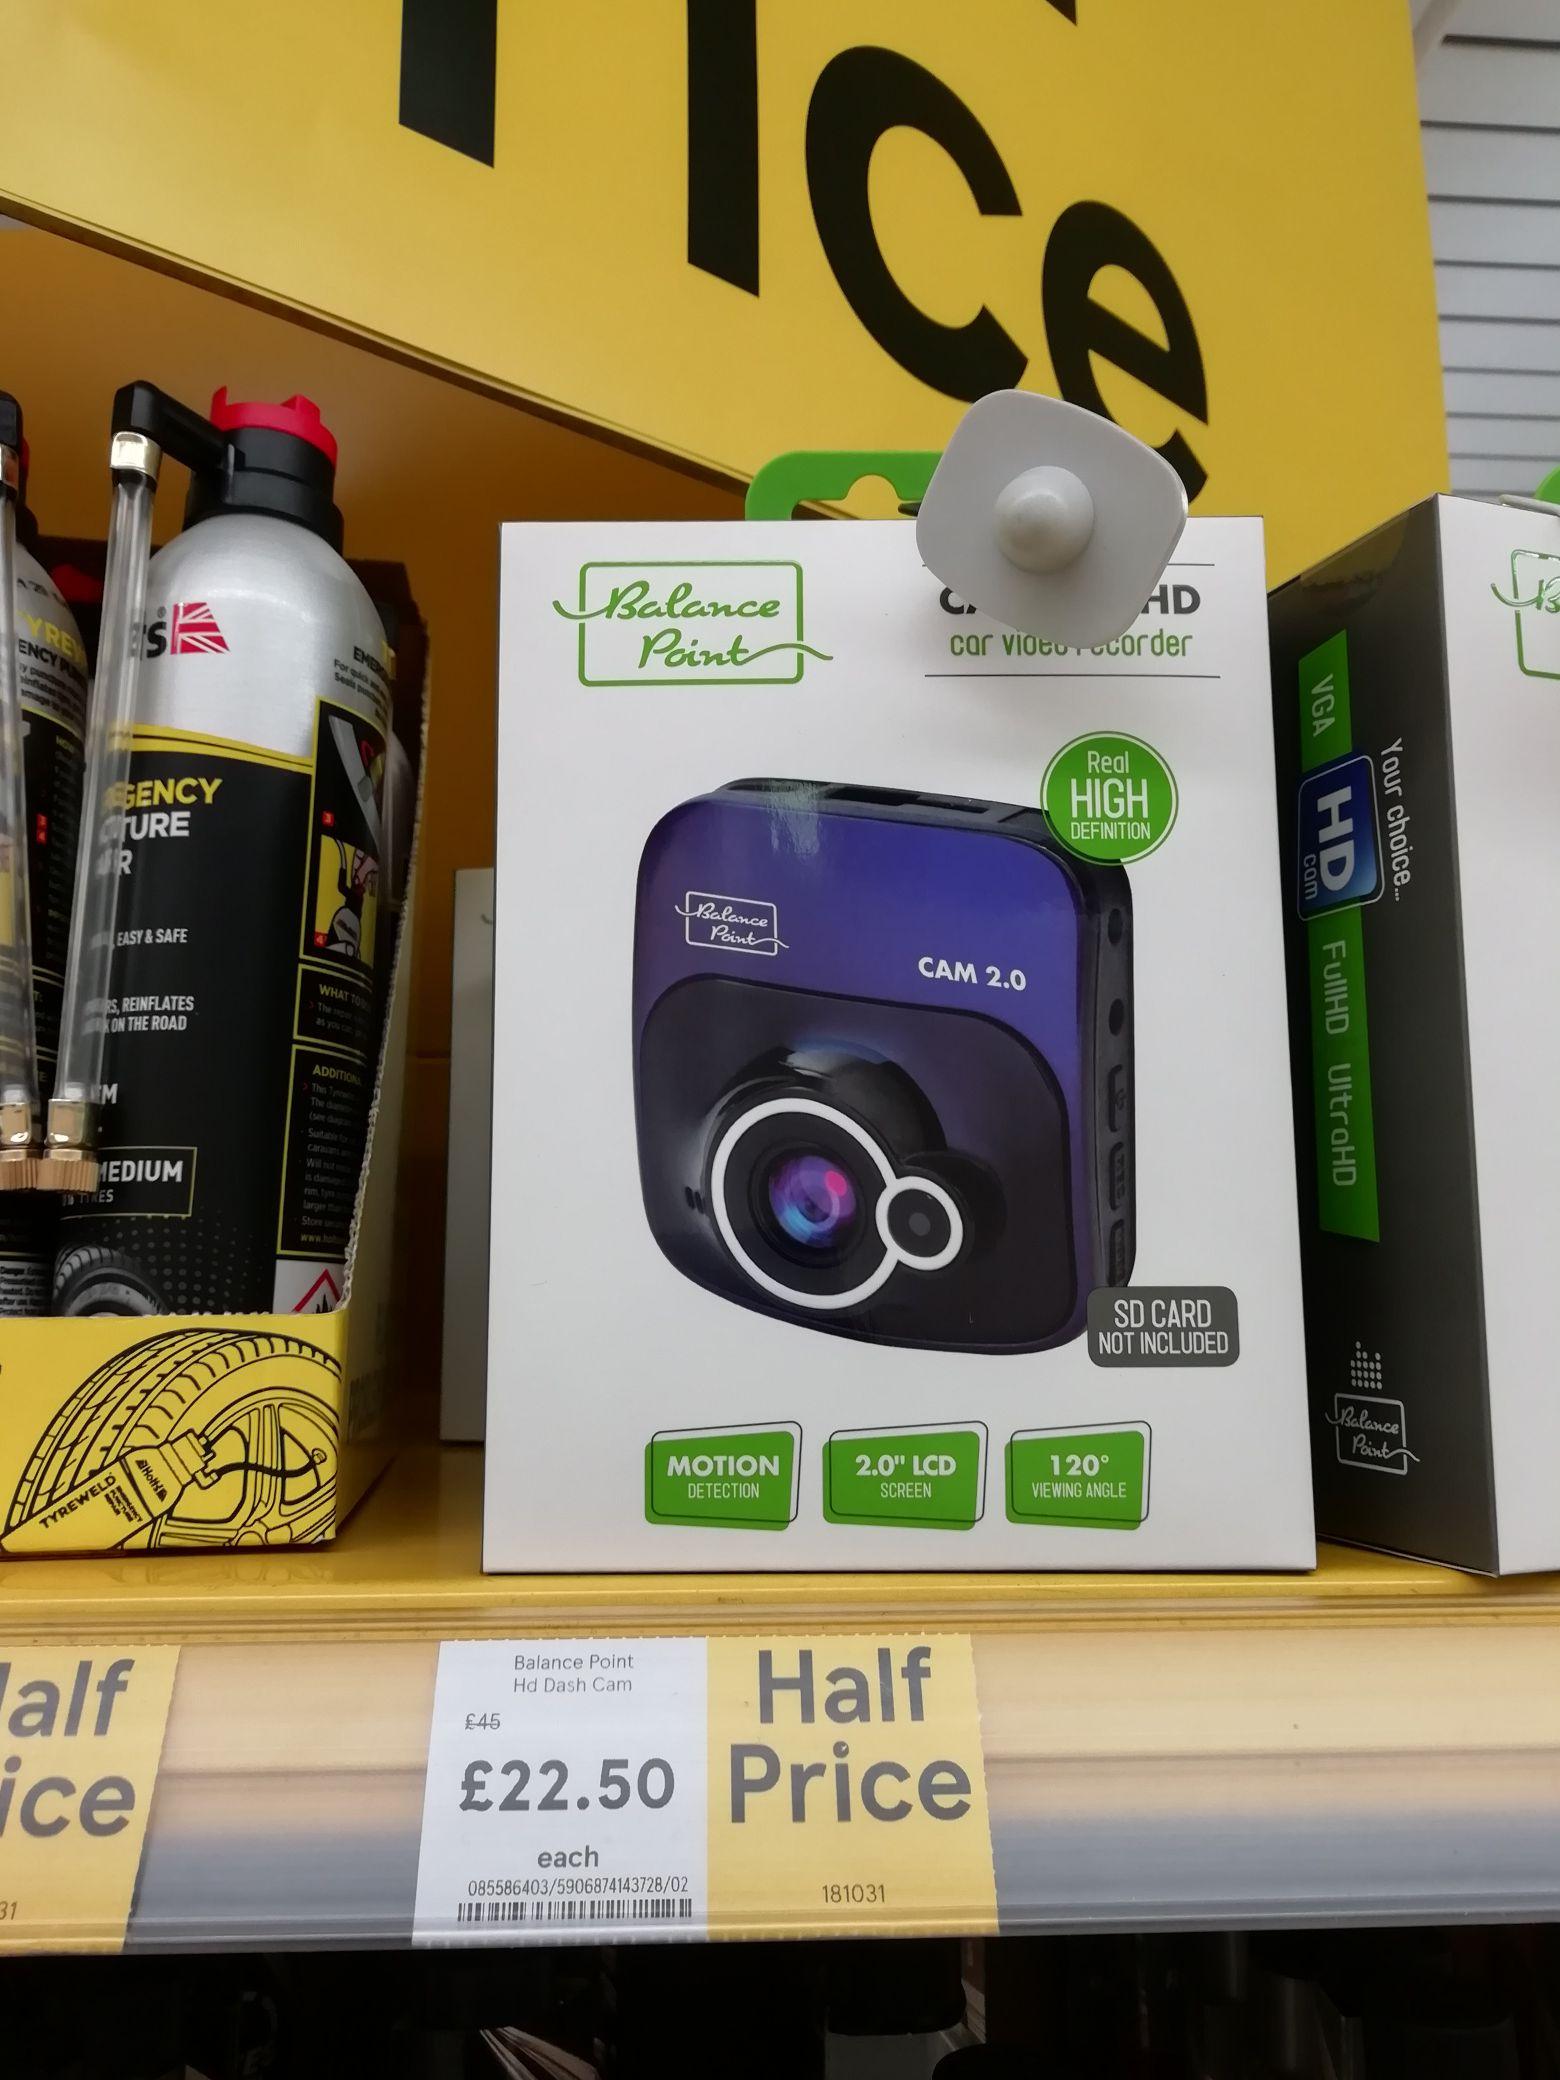 Balance Point  HD Dashcam  half price £22.50 instore at Tesco